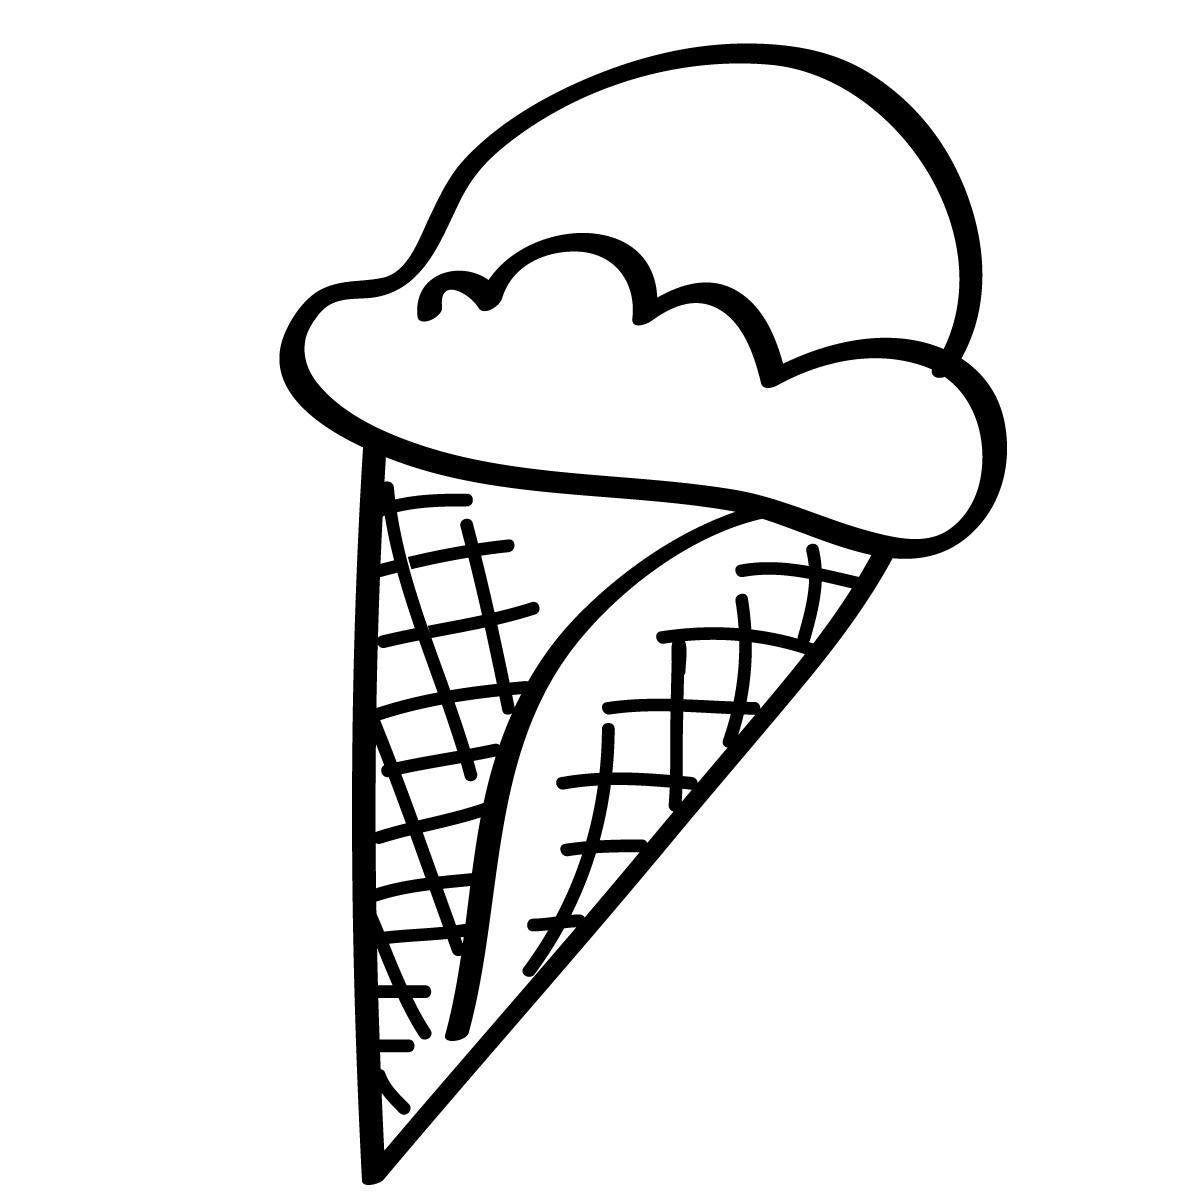 Ice cream clipart free images 4